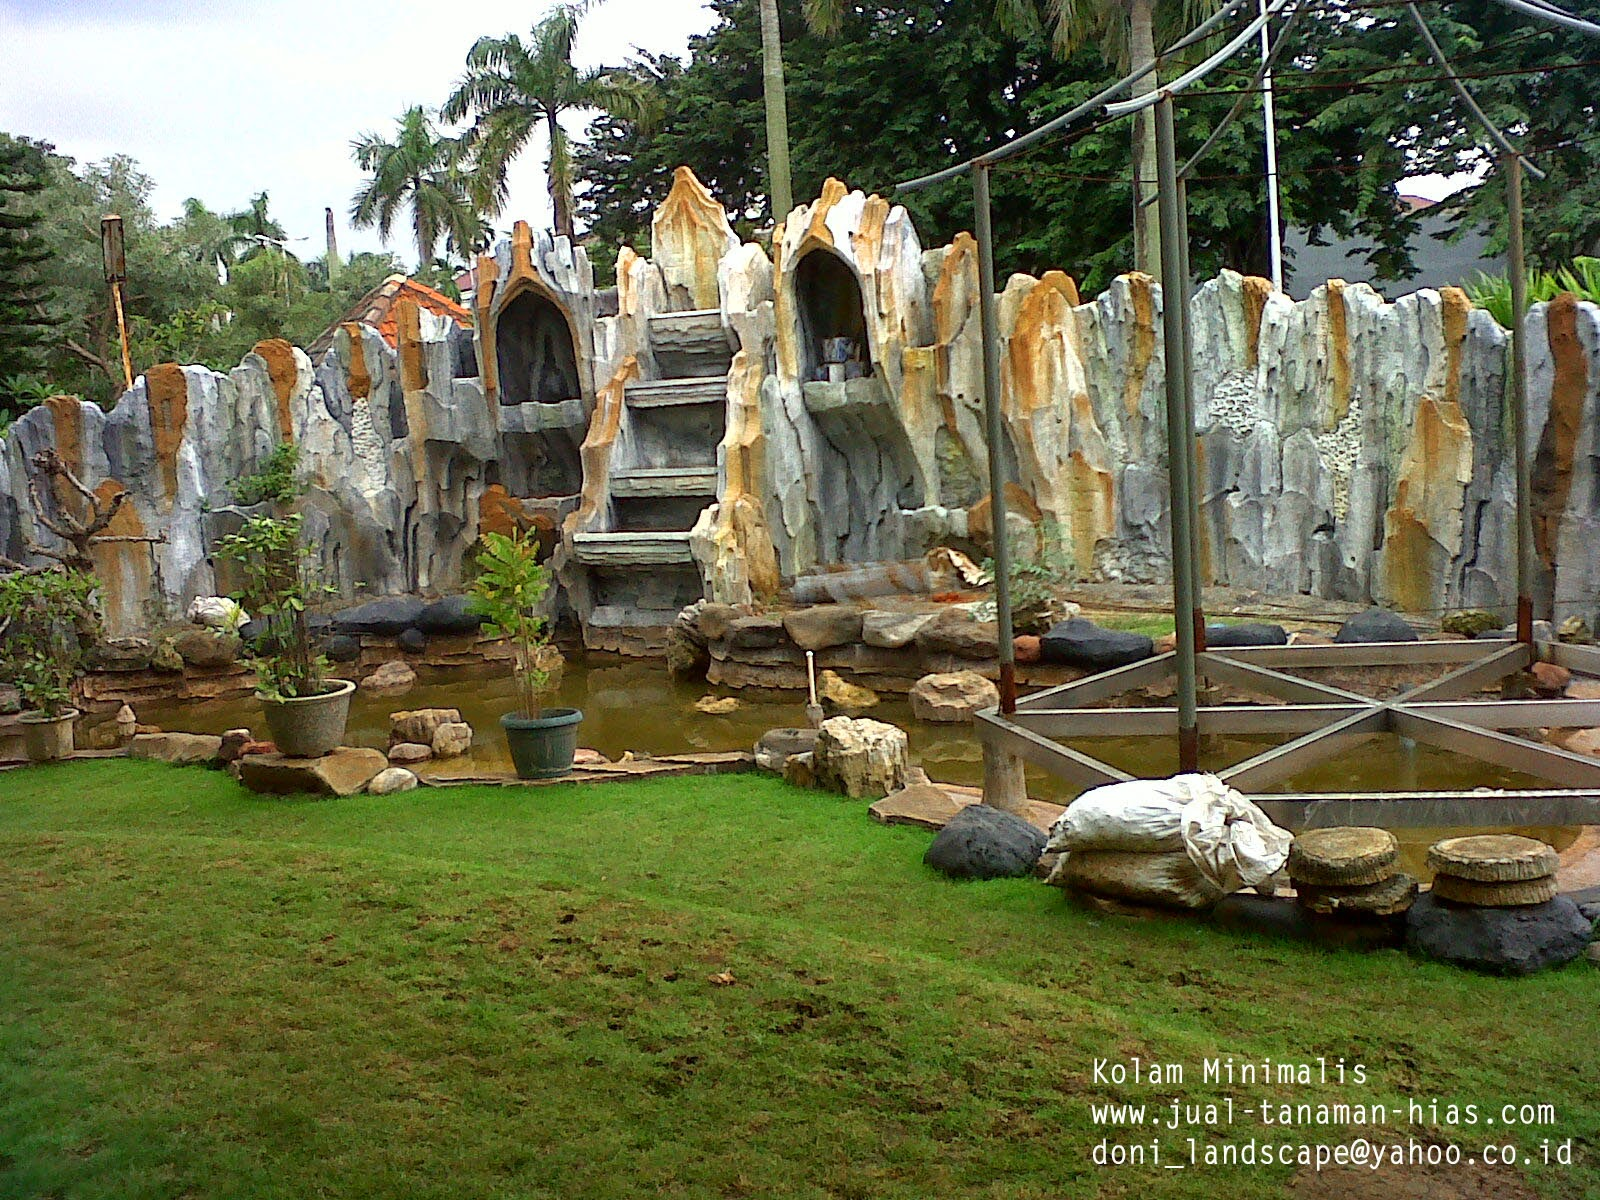 Kolam Relief | Kolam Air Mancur | Hiasan Dinding | Dinding Relief | Kolam Mini | Kolam Minimalis & Koi / Ikan | Saung Gazebo Bambu & Kayu Kelapa